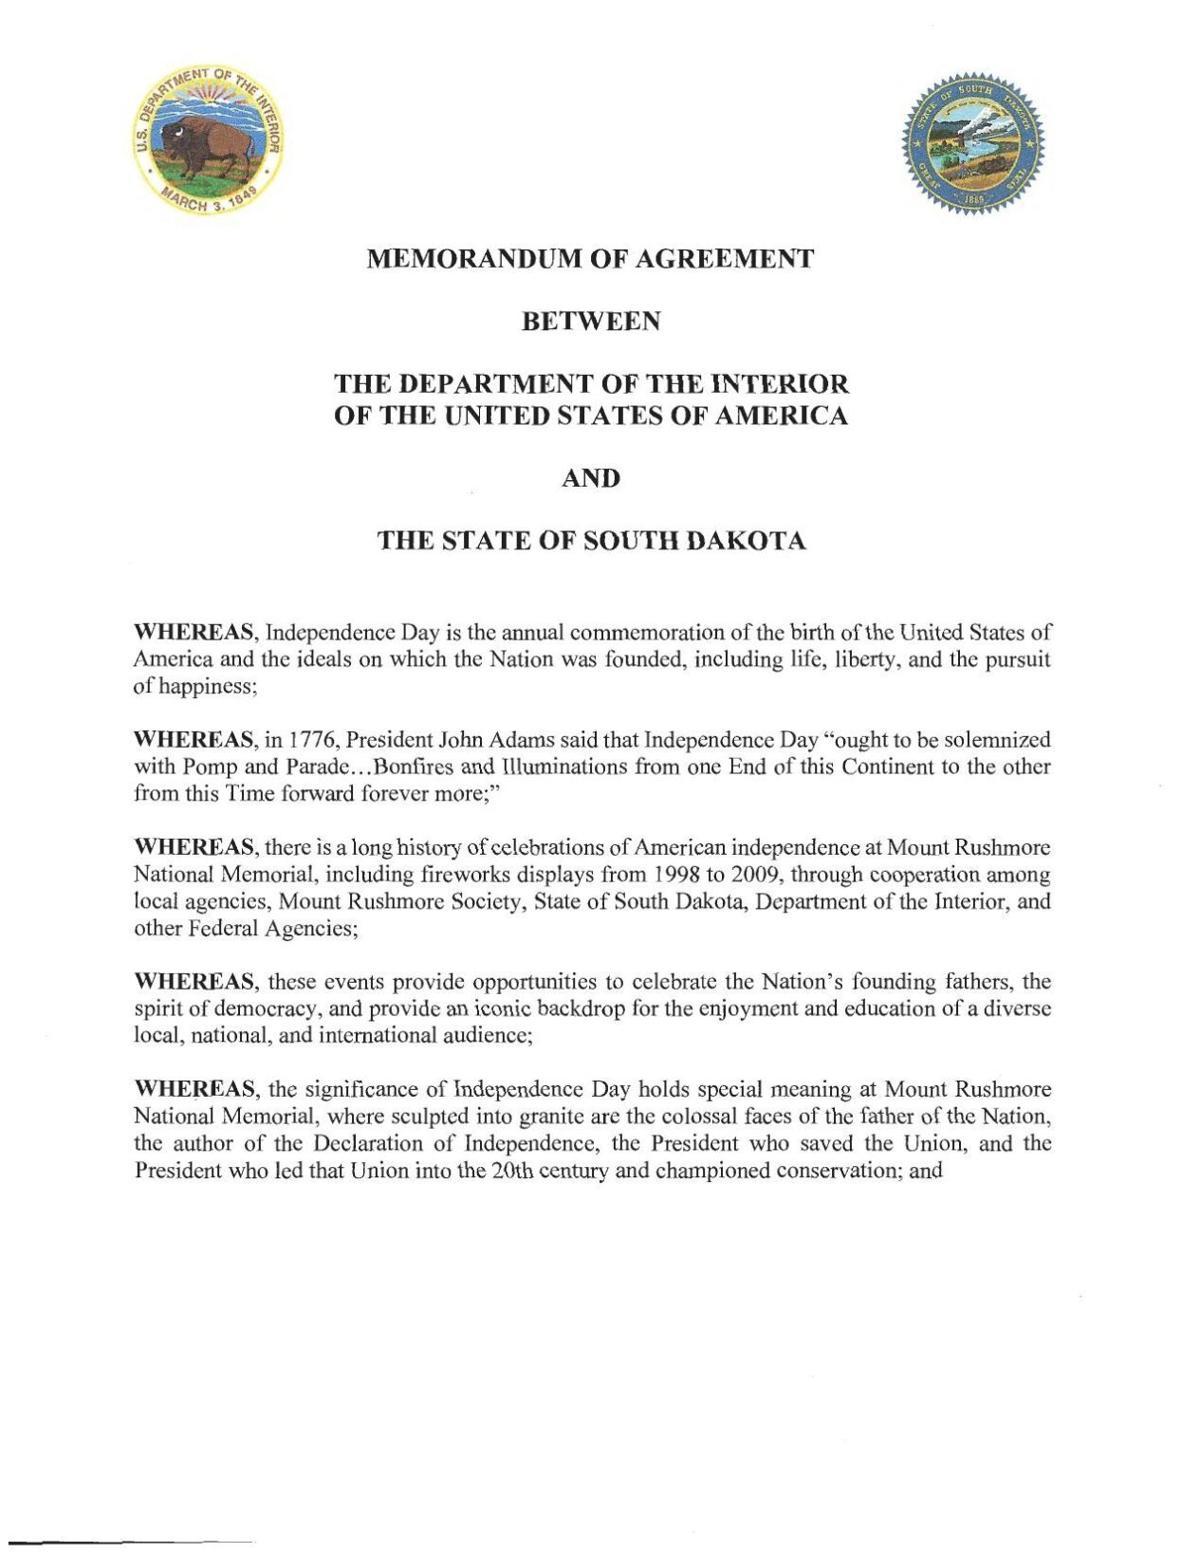 2019 DOI-SD agreement